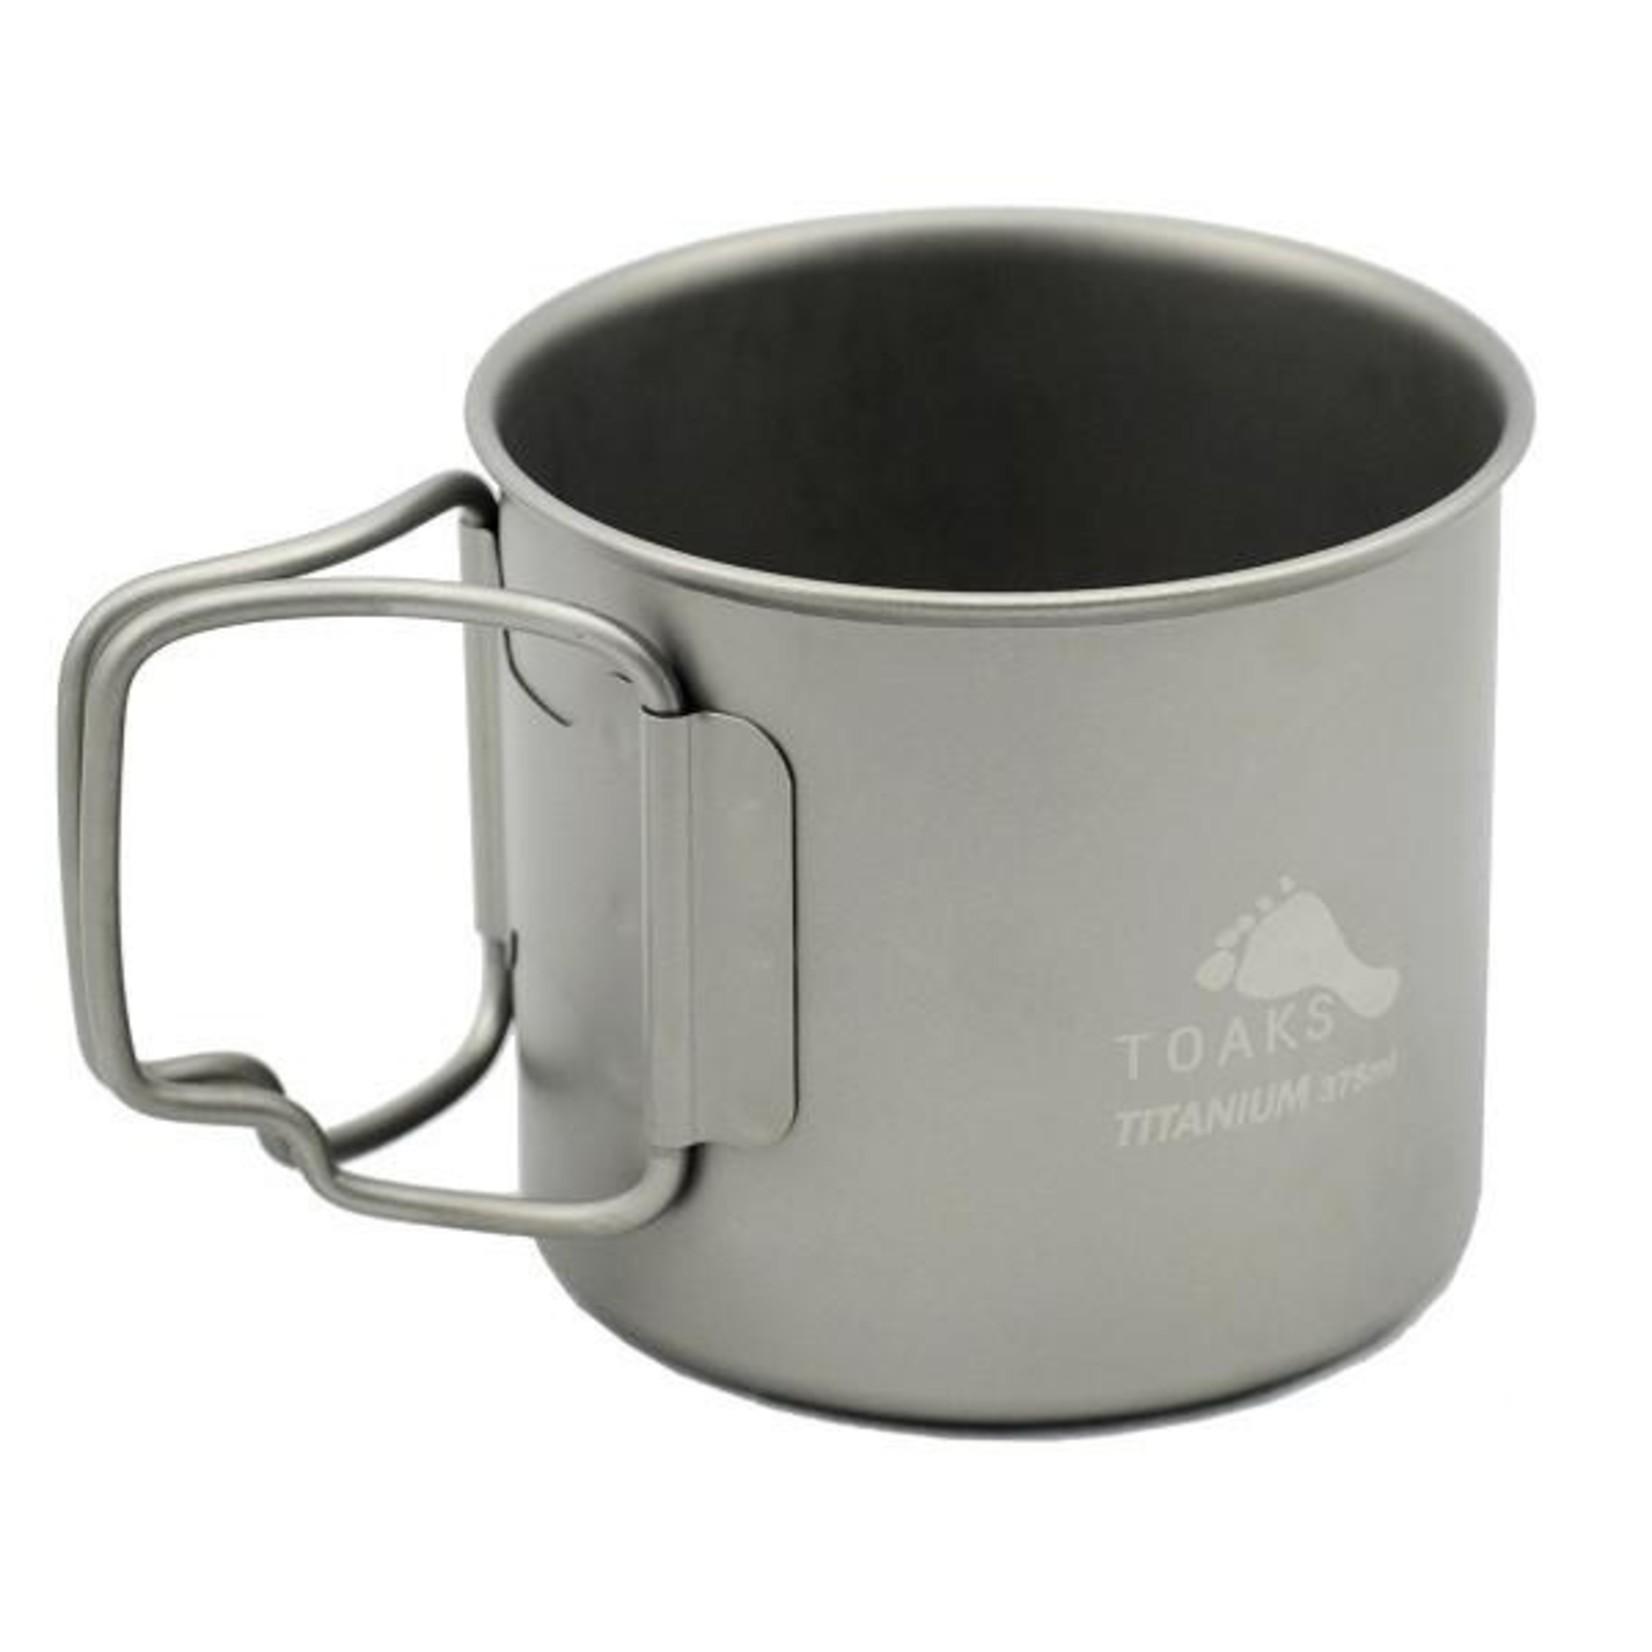 Toaks Toaks, Titanium 375ml Cup